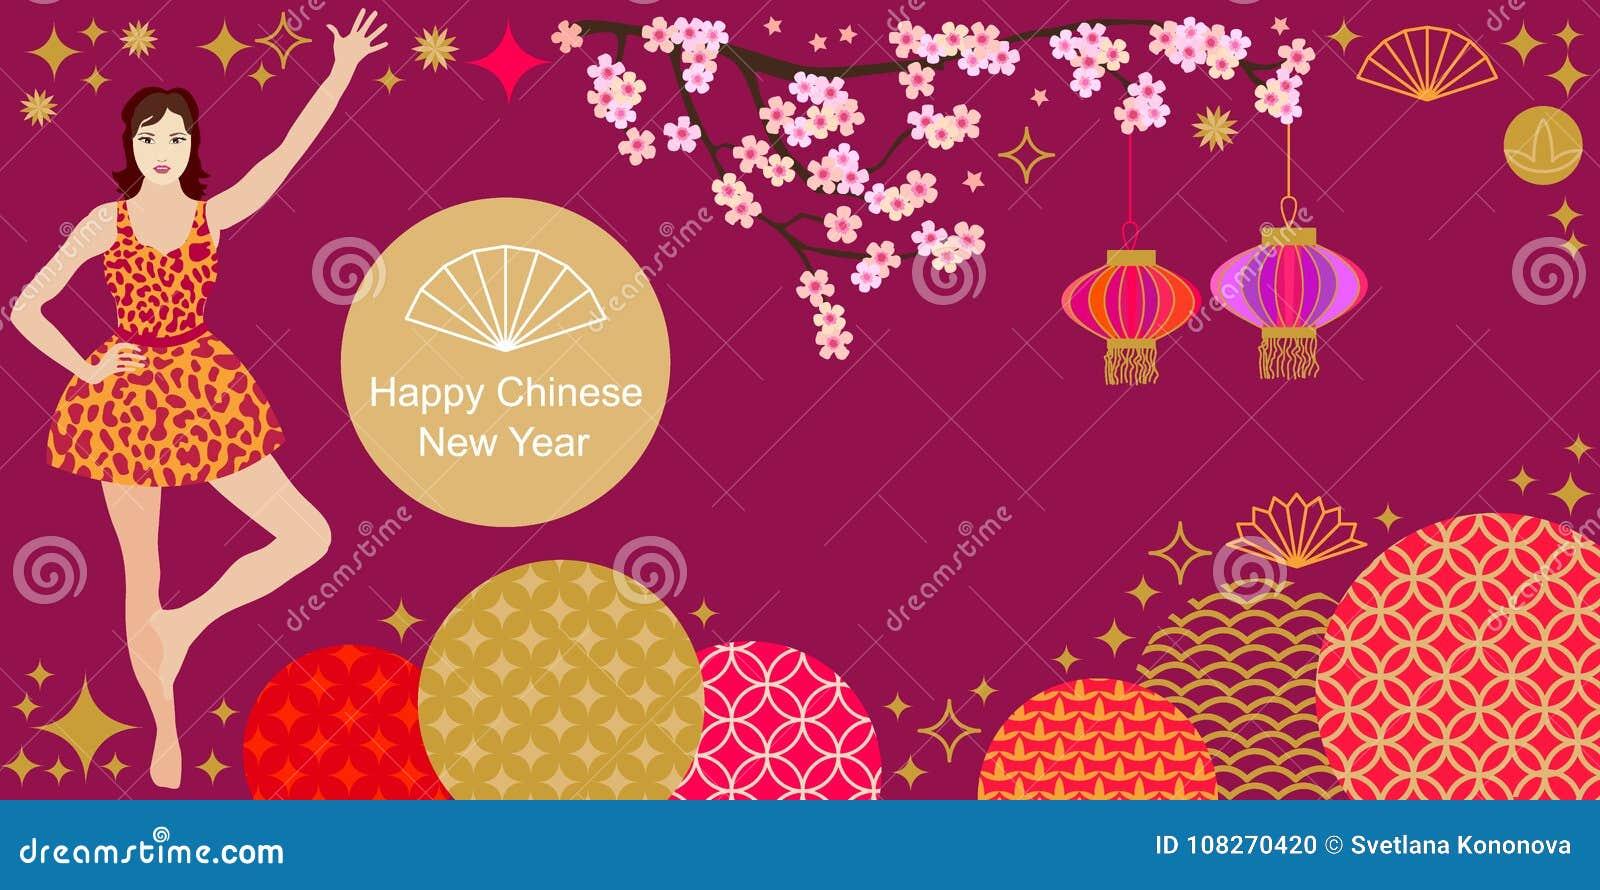 happy chinese new year card beautiful asian girl abstract ornaments blooming sakura and